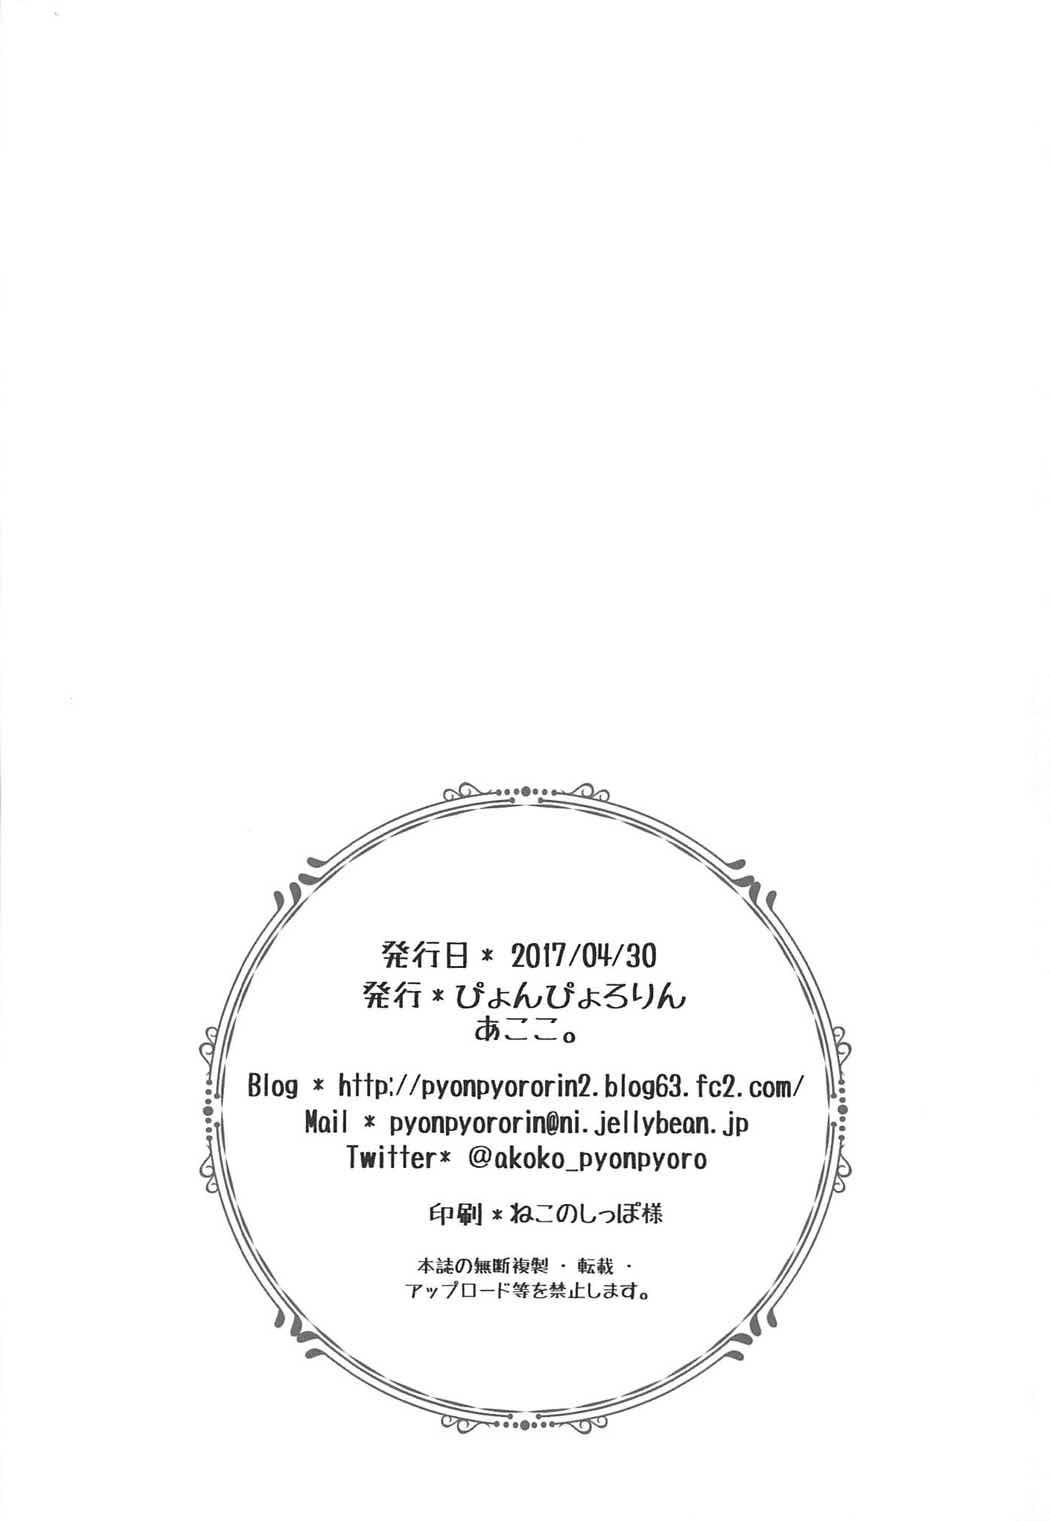 (COMIC1☆11) [Pyonpyororin (Akoko.)] - 1 day ago - (Fate/Grand Order) 28